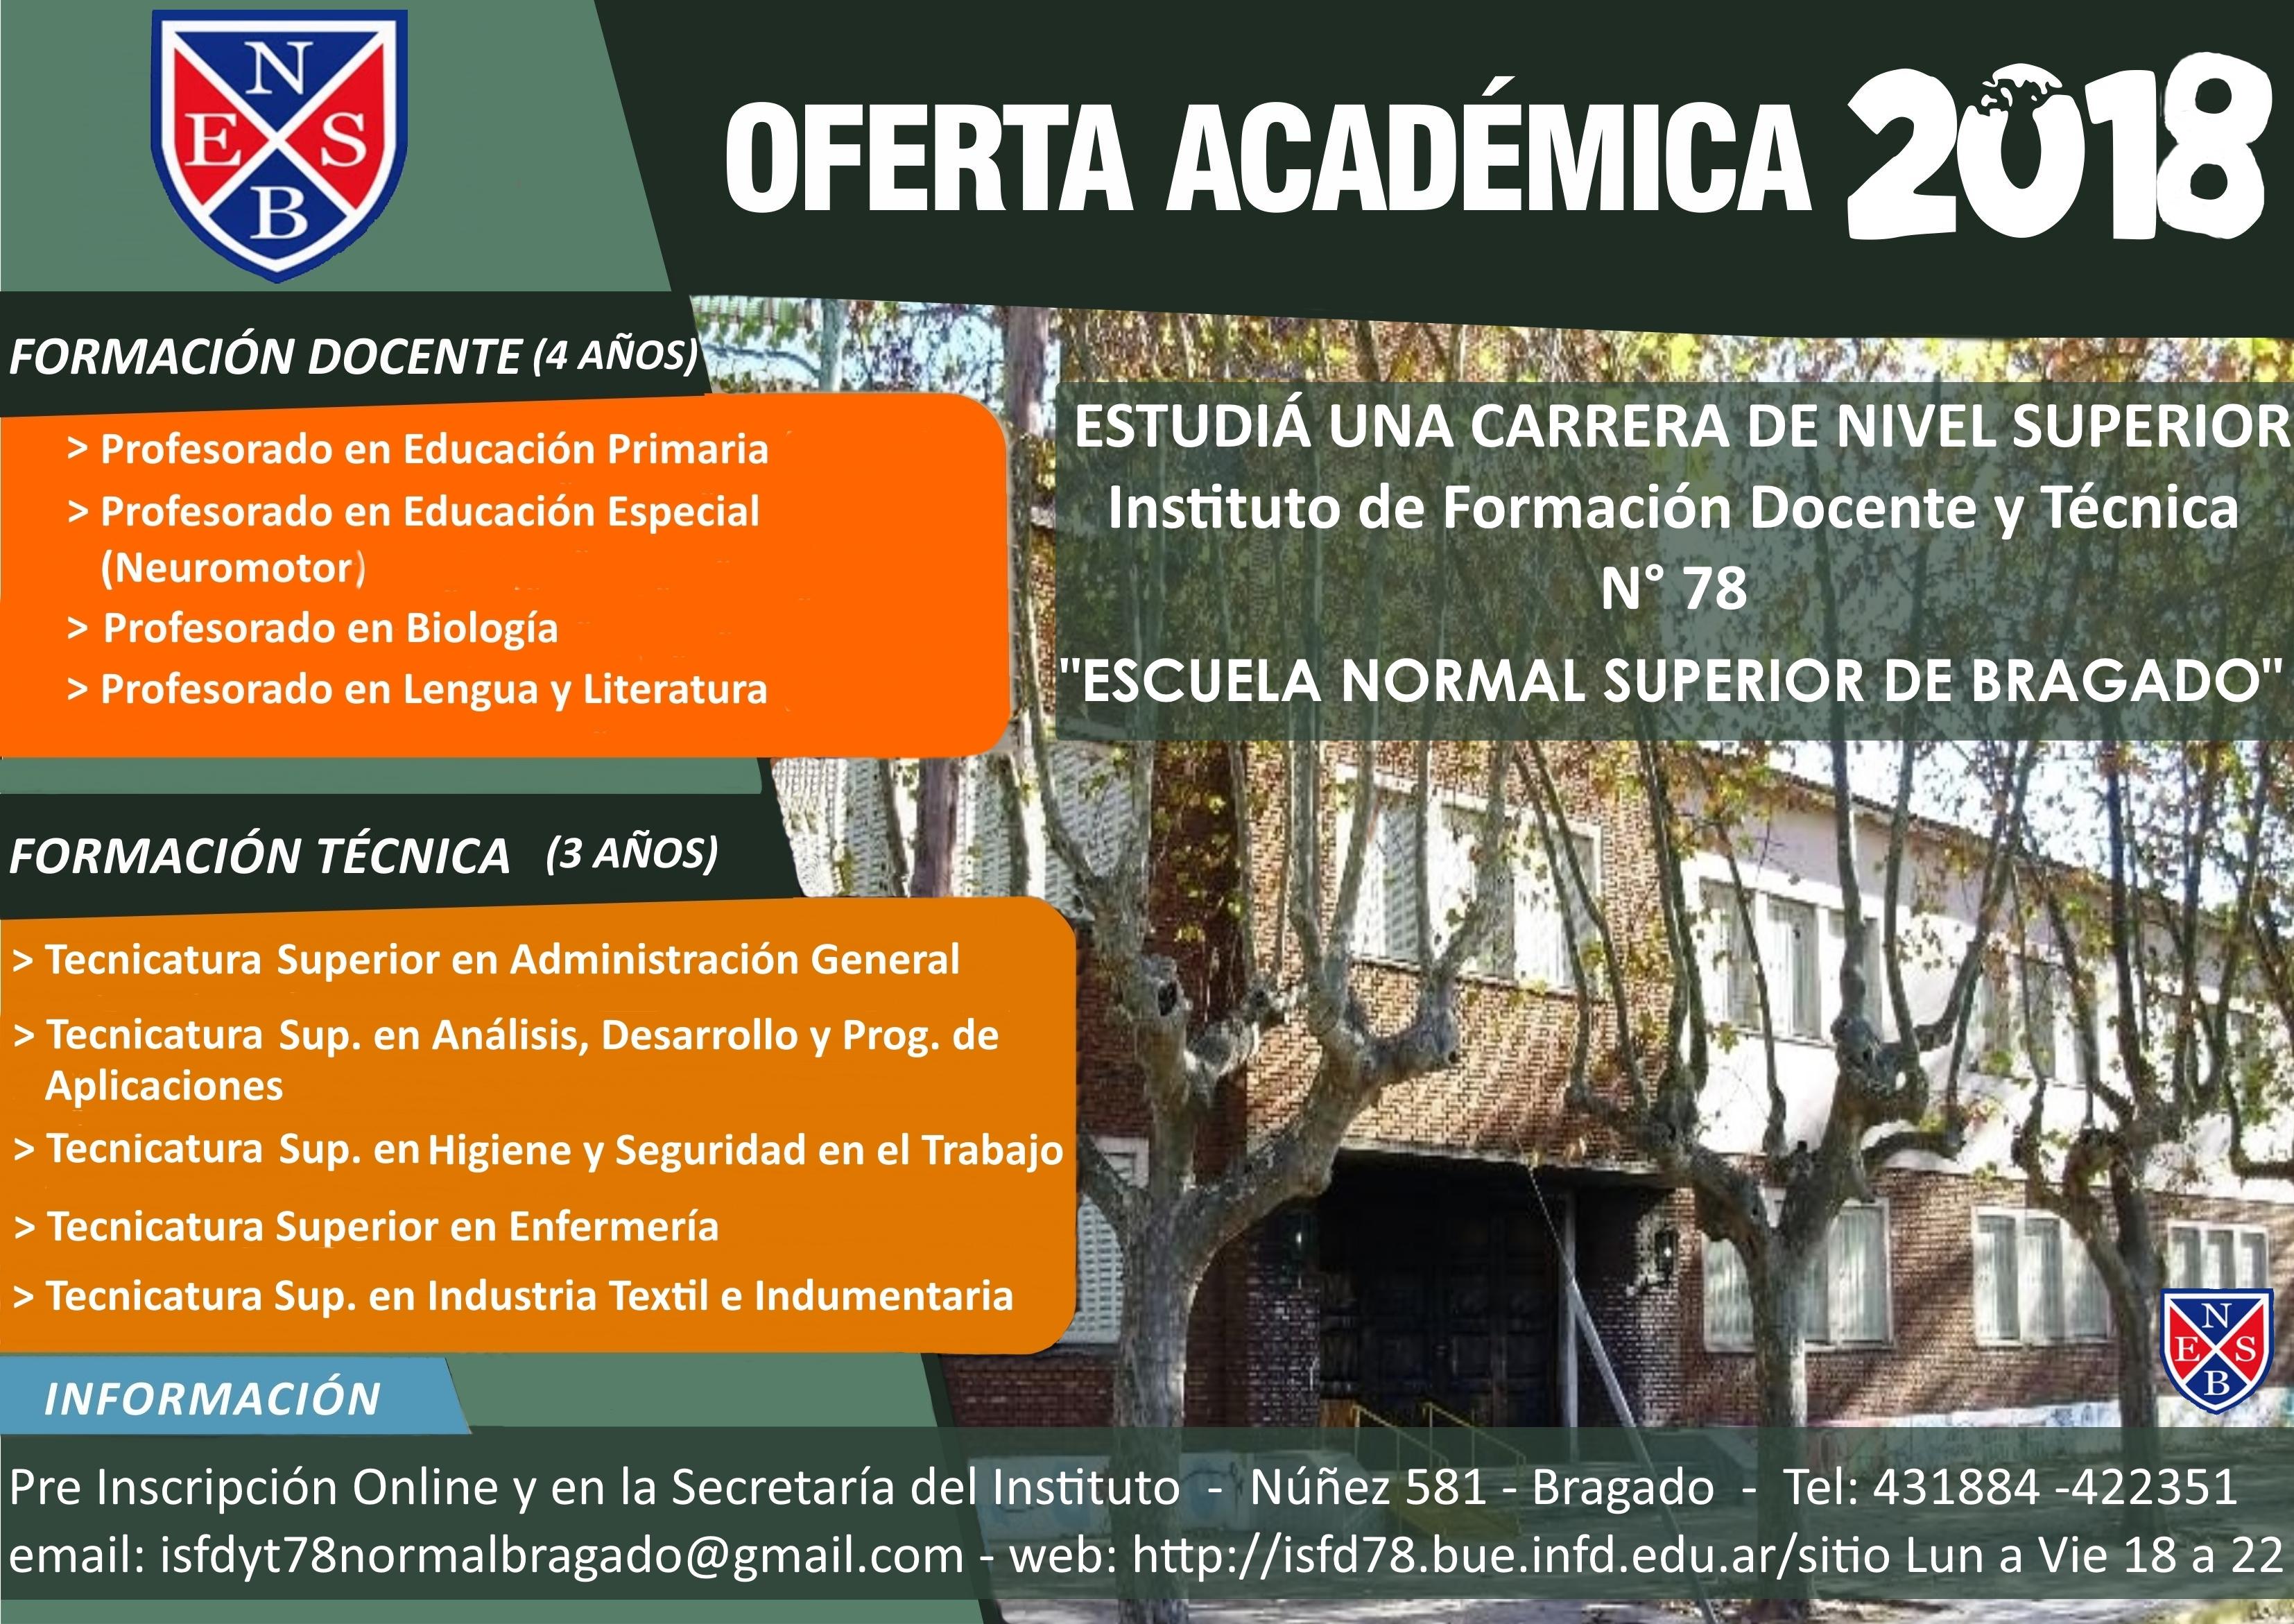 Instituto superior de formaci n docente y t cnica n 78 for Instituto formacion docente